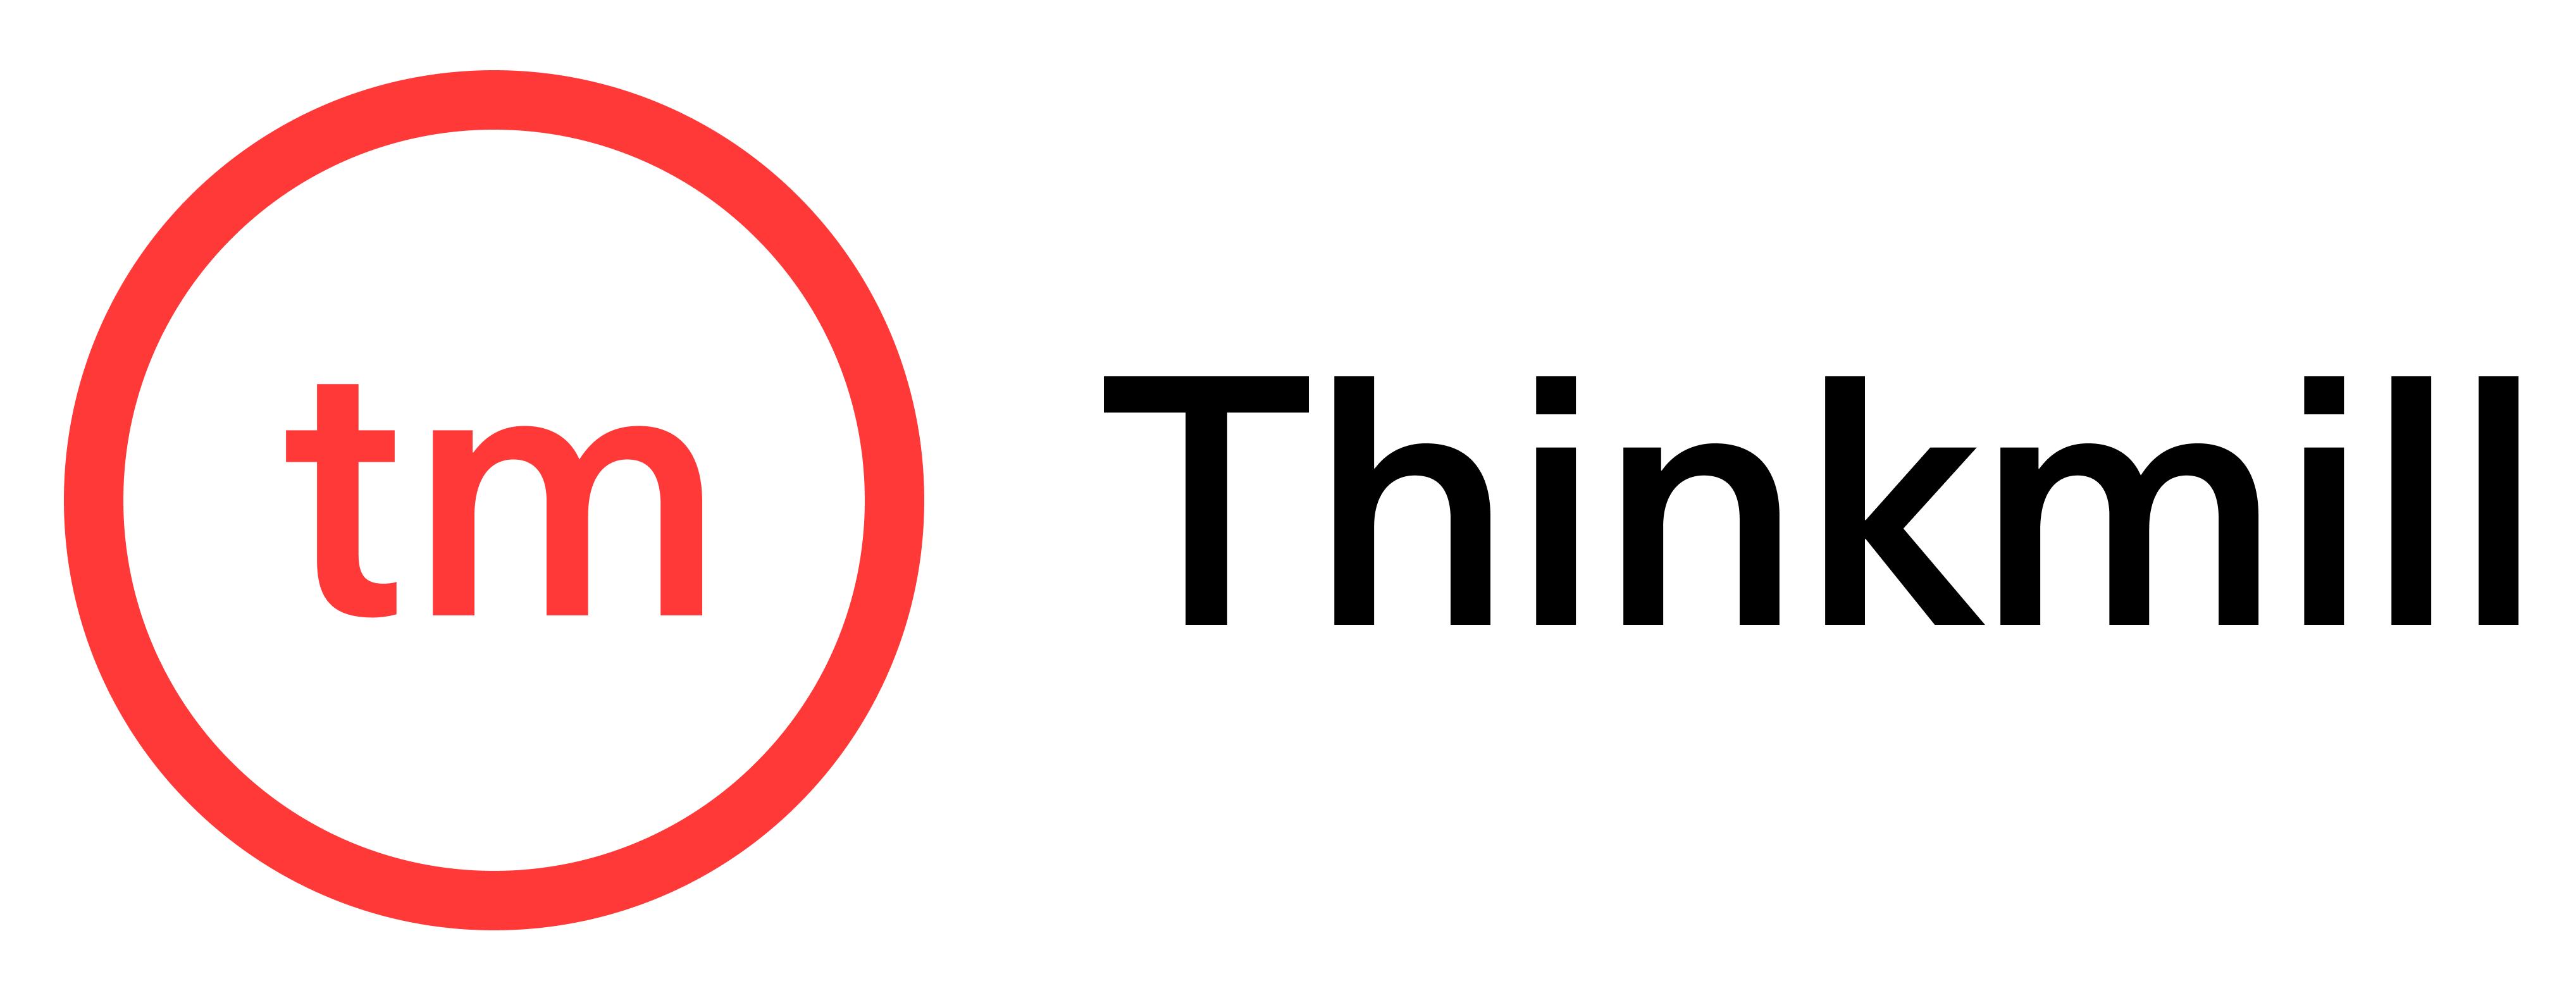 Thinkmill